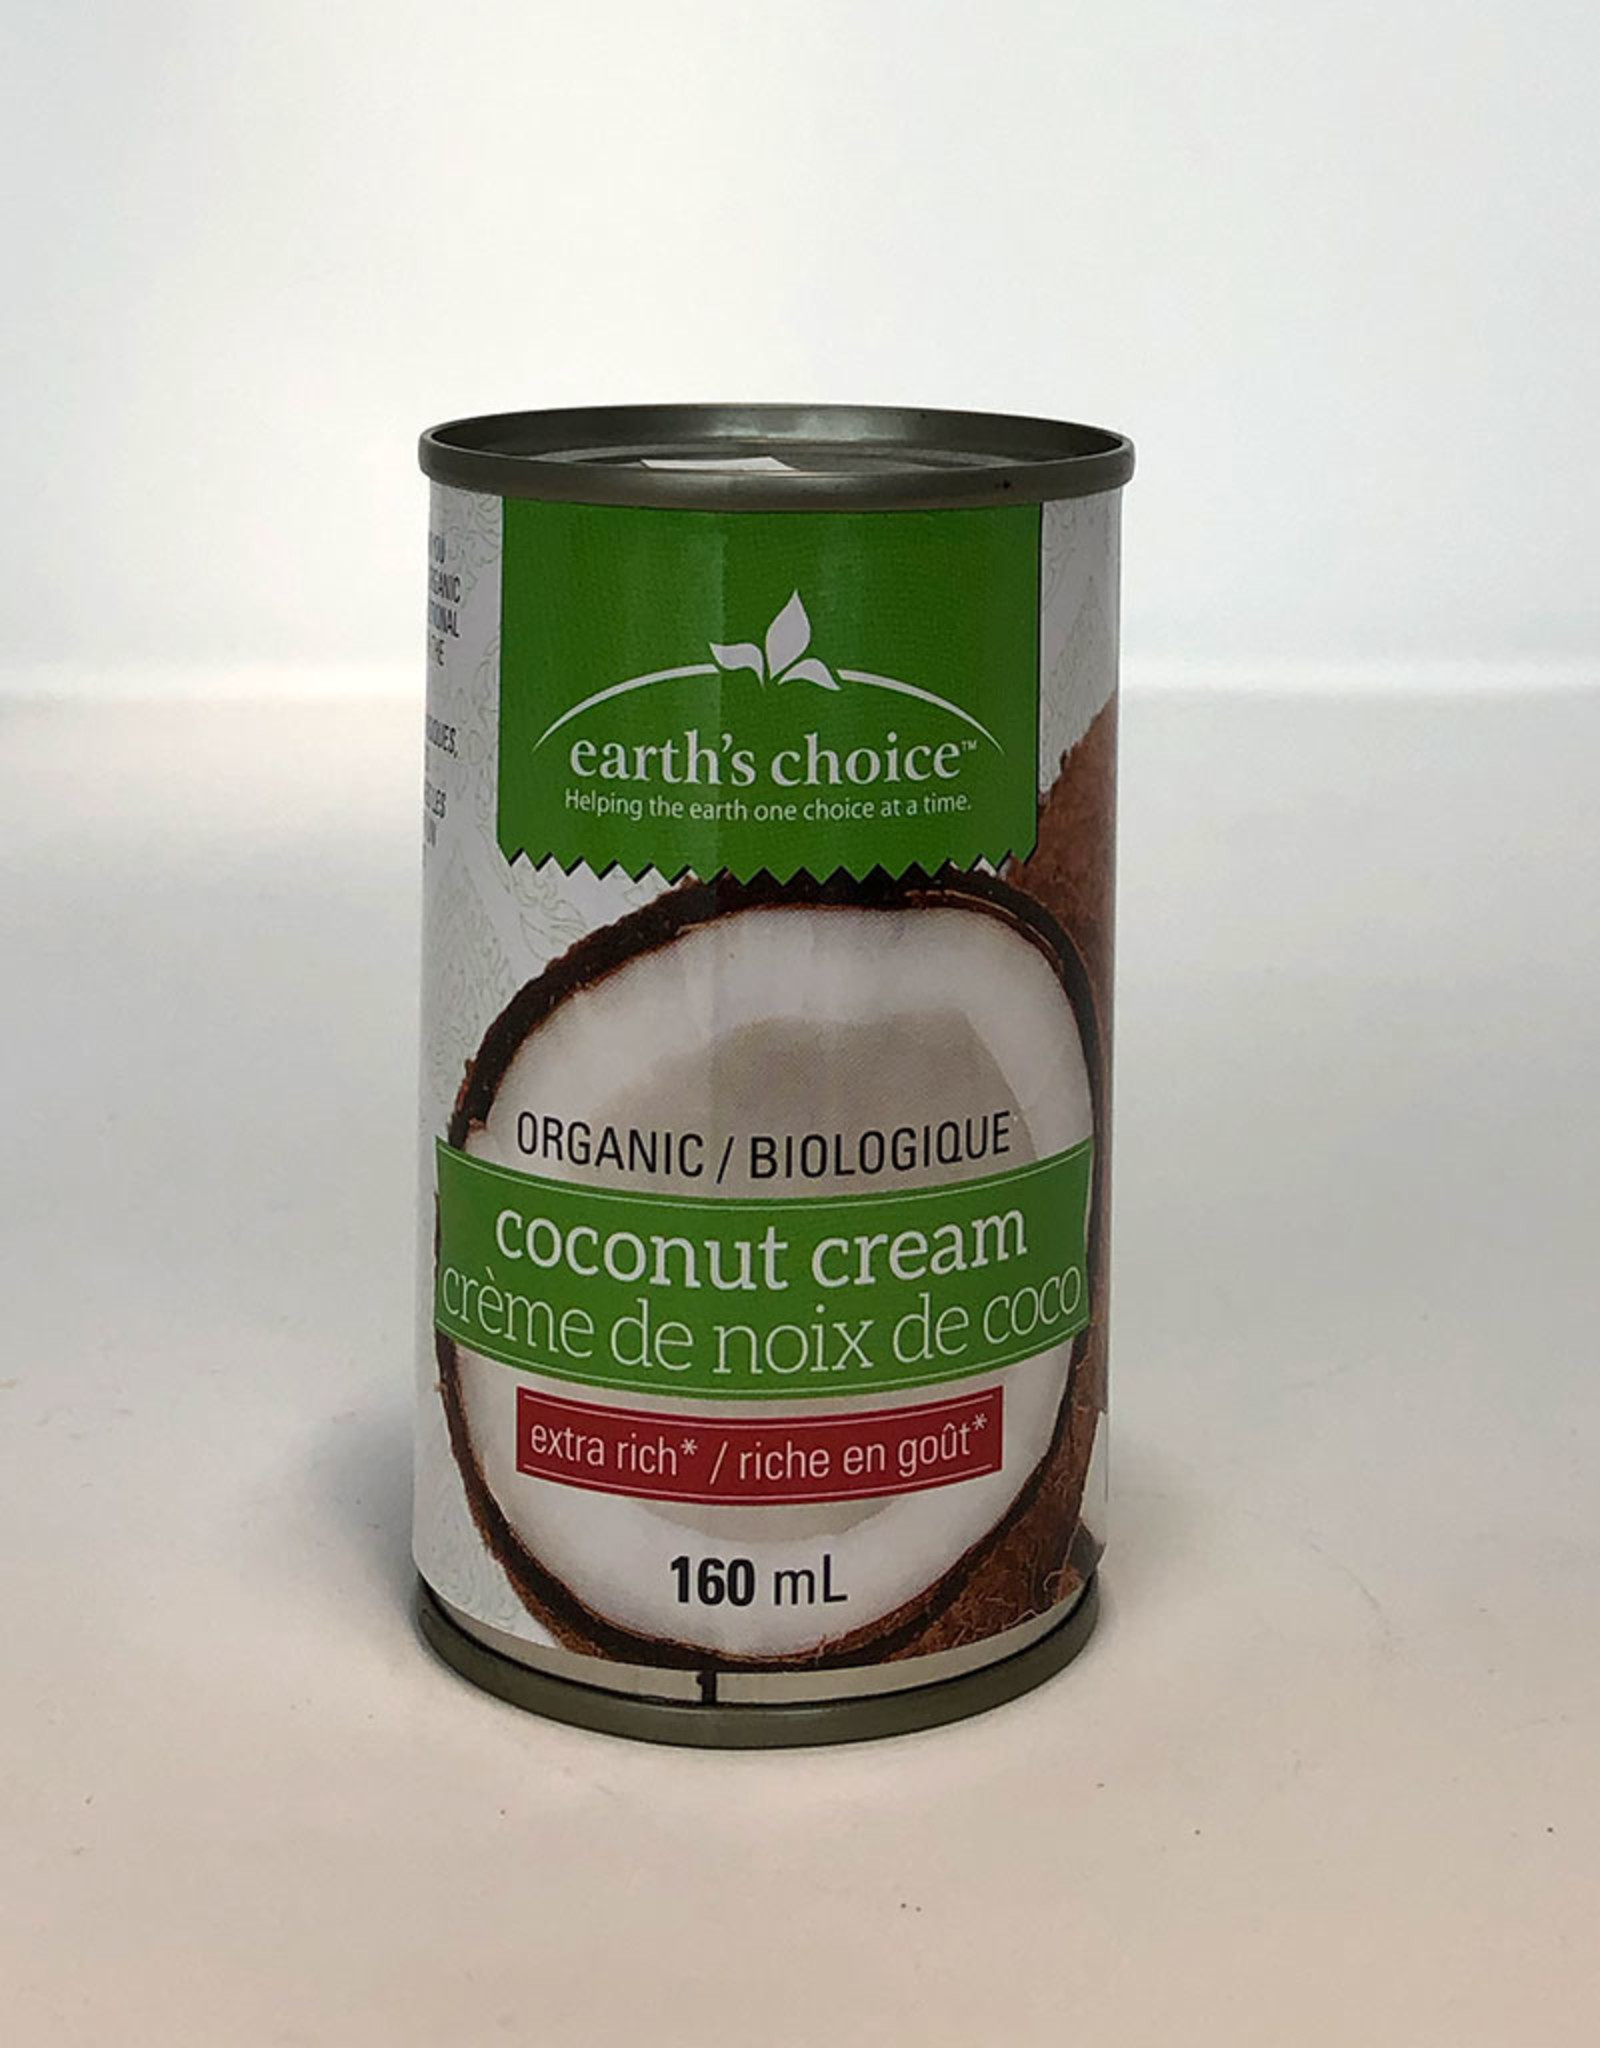 Earth's Choice Earths Choice - Organic Coconut Cream (160ml)